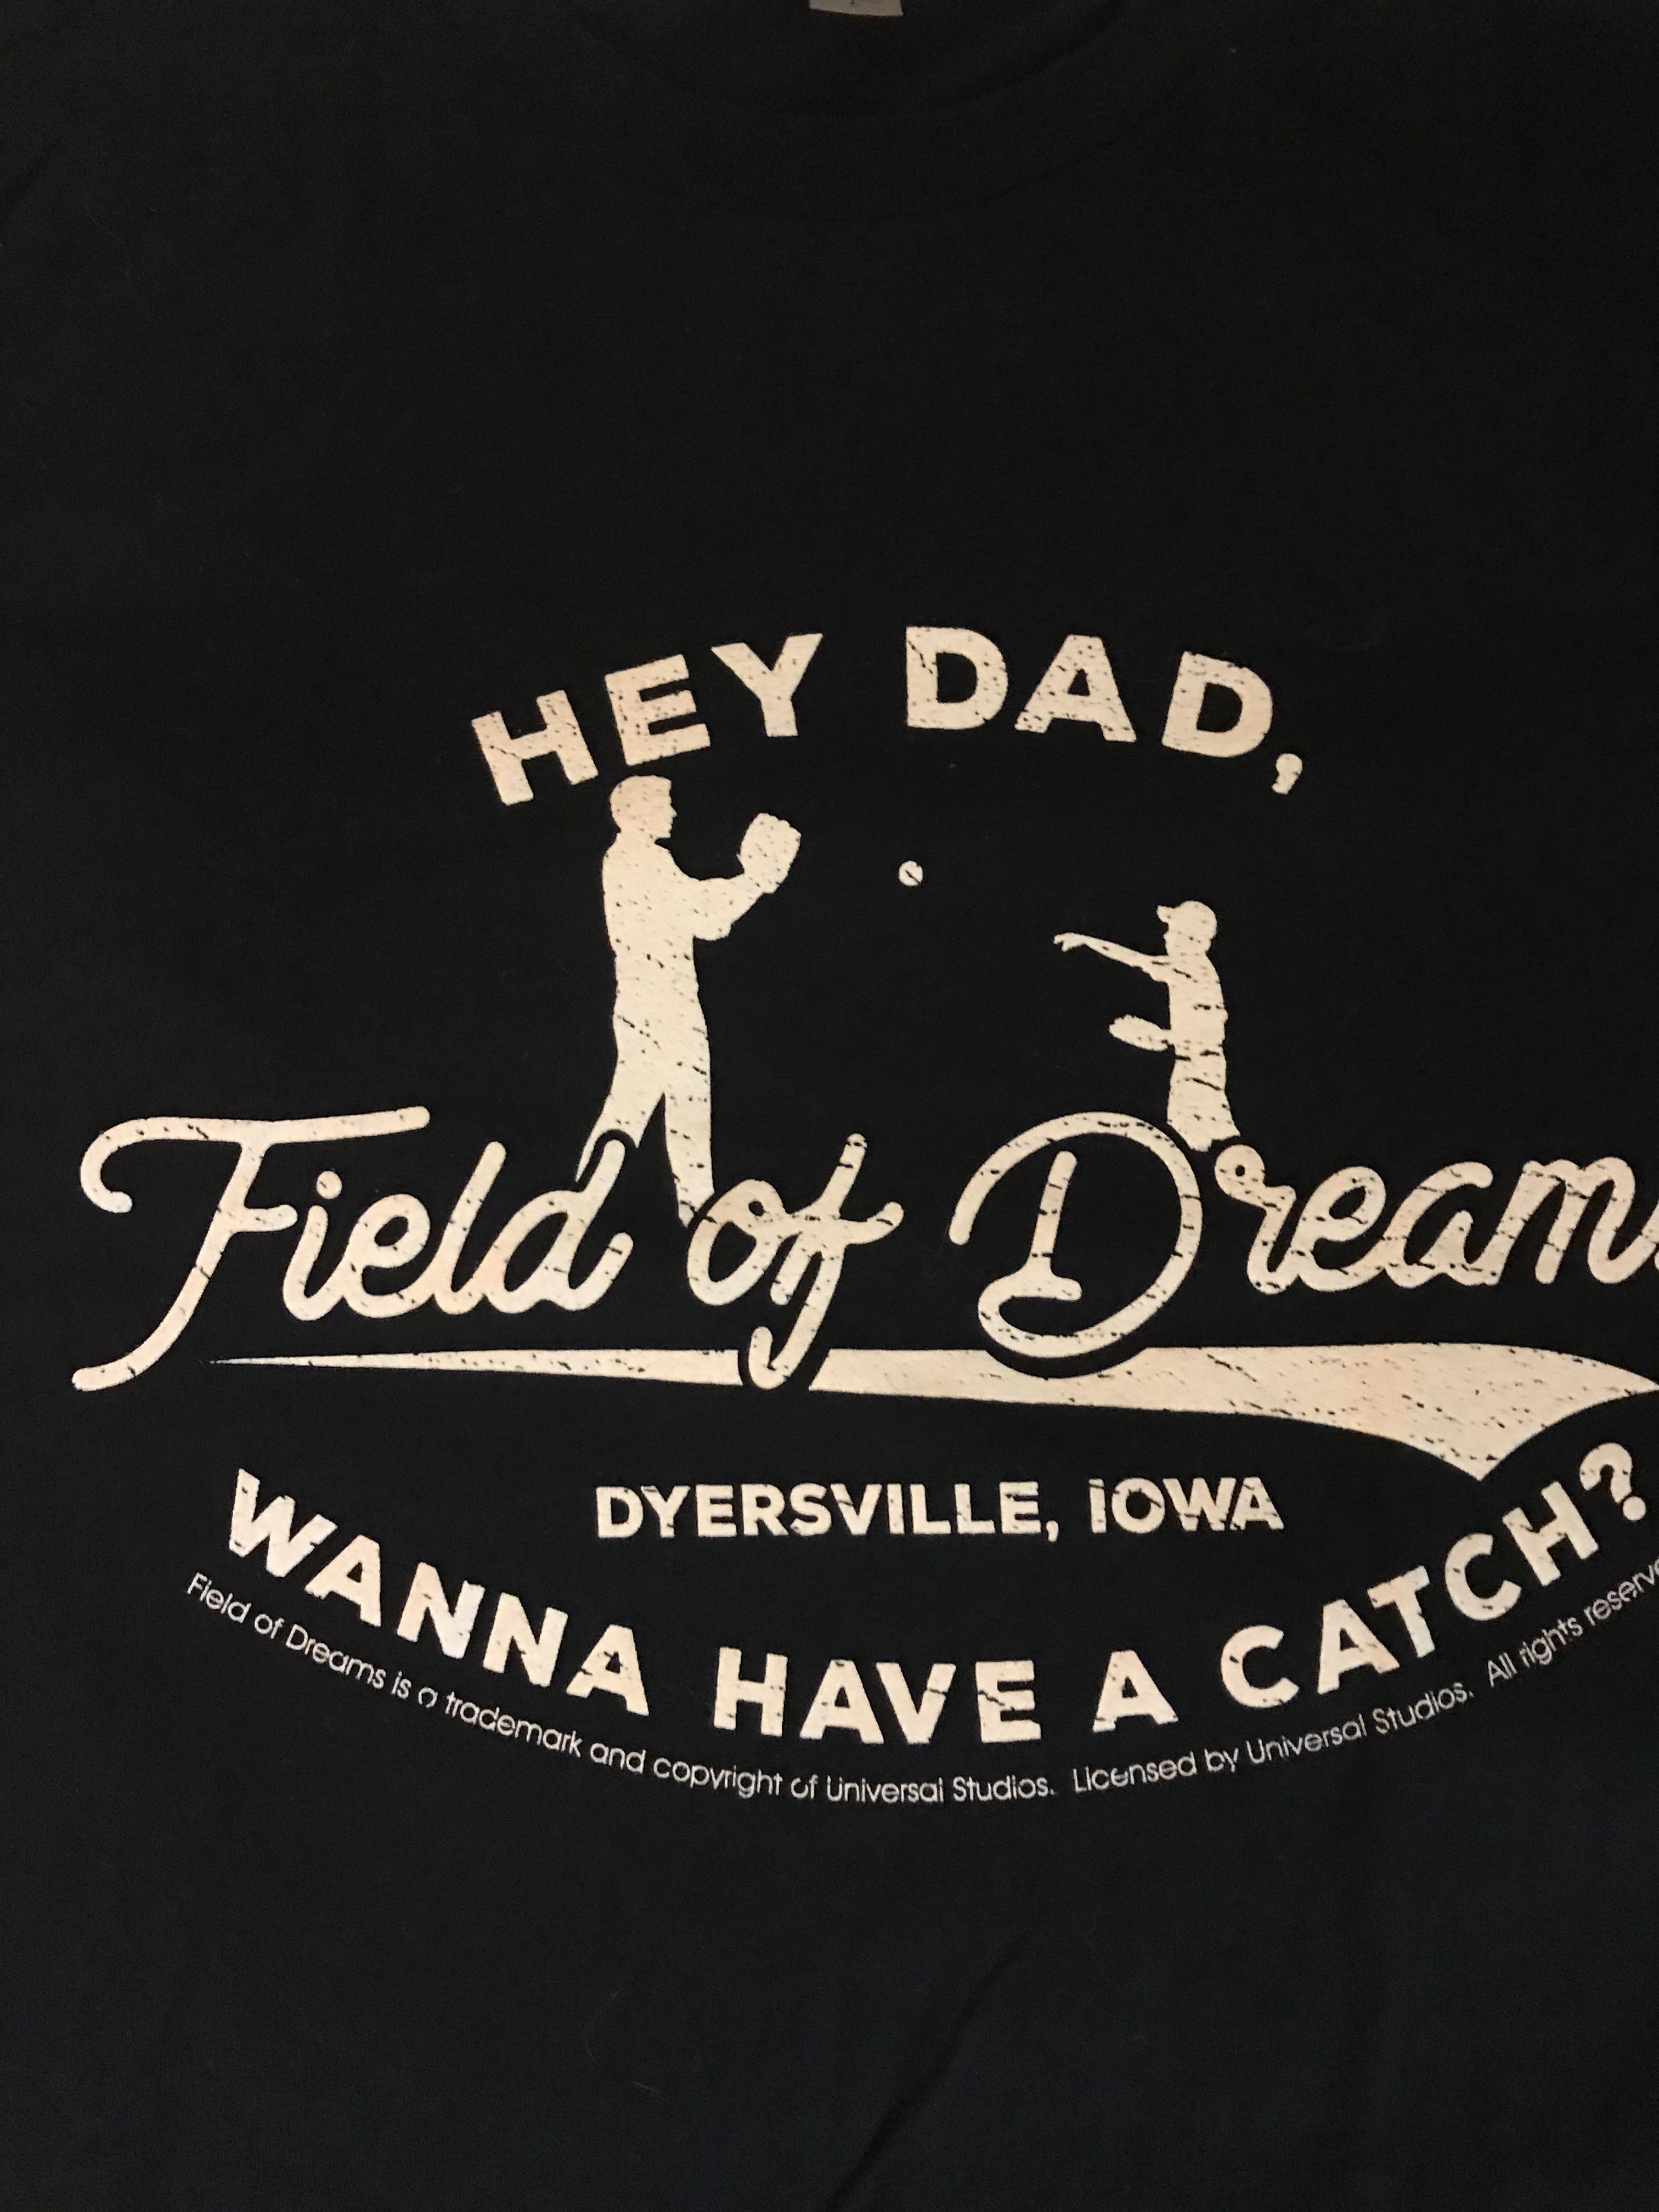 Field of Dreams Souvenir -- Photo by Matt Melis